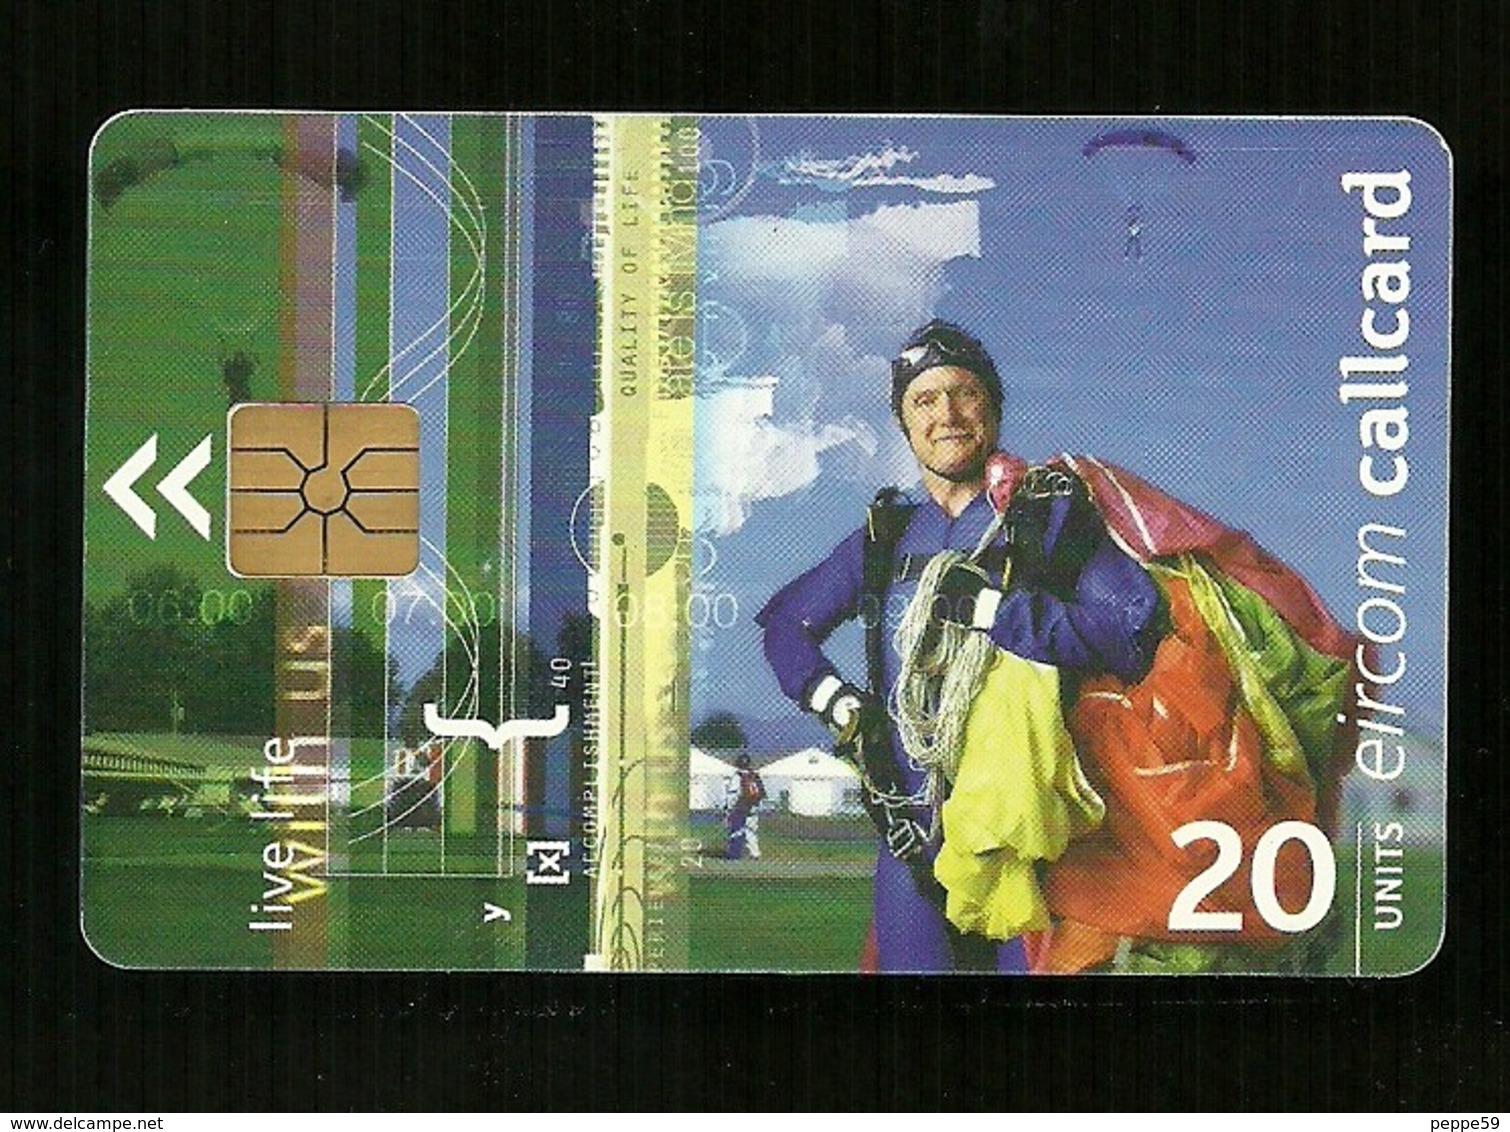 Carta Telefonica Irlanda - Eircom 20 U - Carte Telefoniche@Scheda@Schede@Phonecards@Telecarte@Telefonkarte - Irlanda